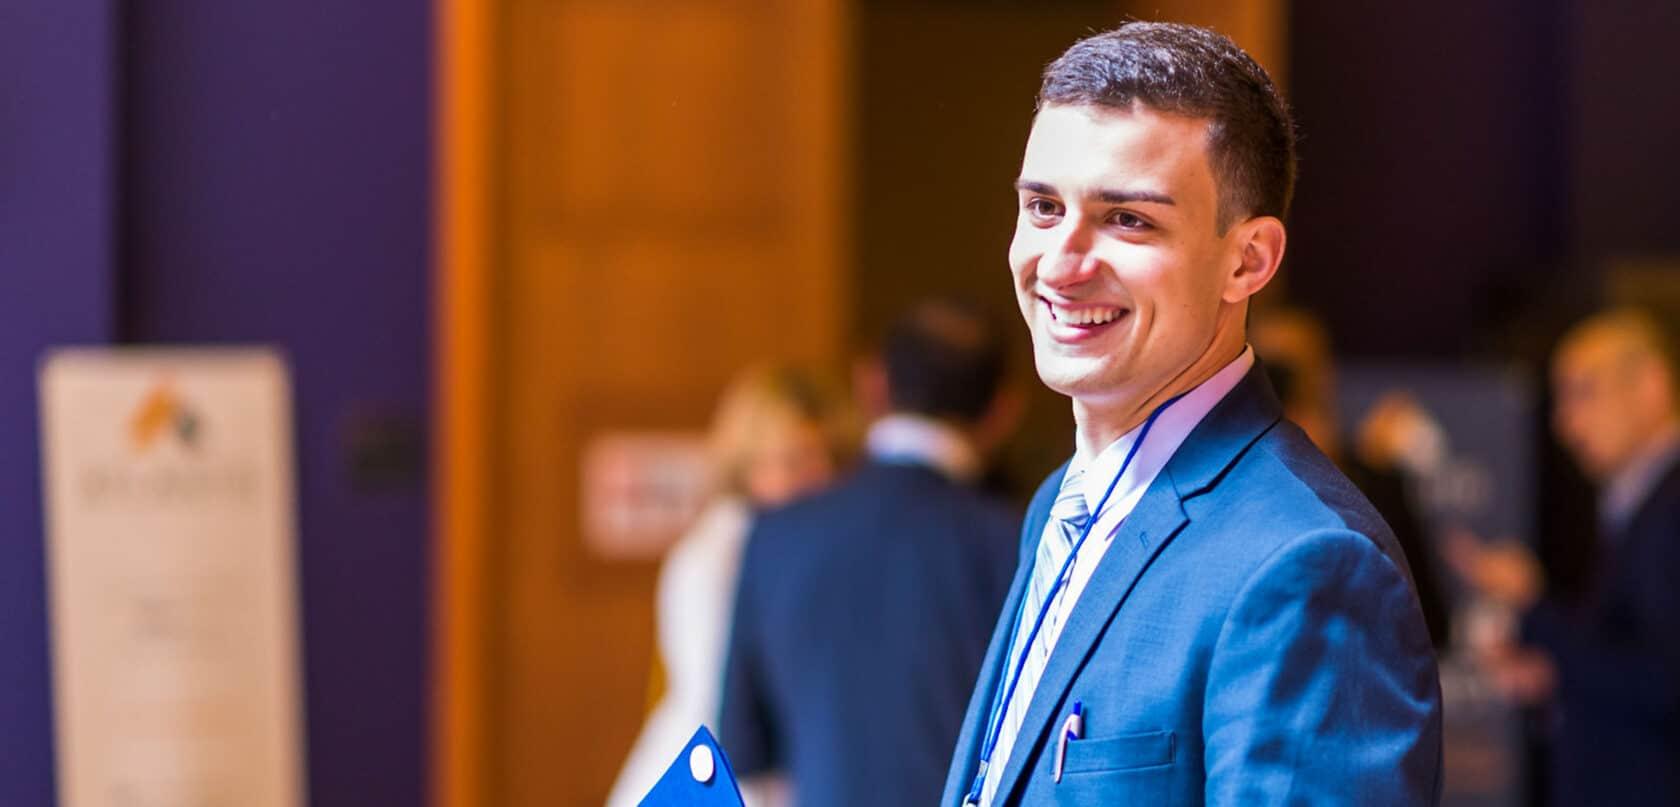 George Bugarinovic, Atlantis Alum and Harvard MS3, presents at Atlantis Connect Conference.